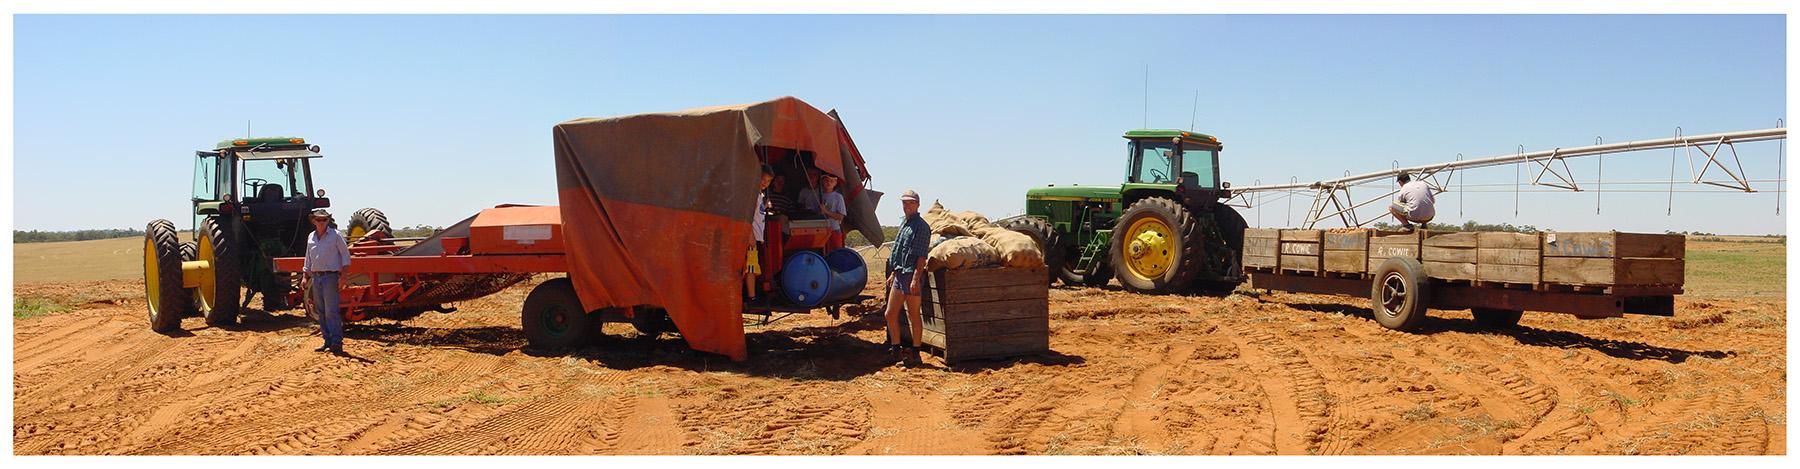 Potato harvesting - Yungera